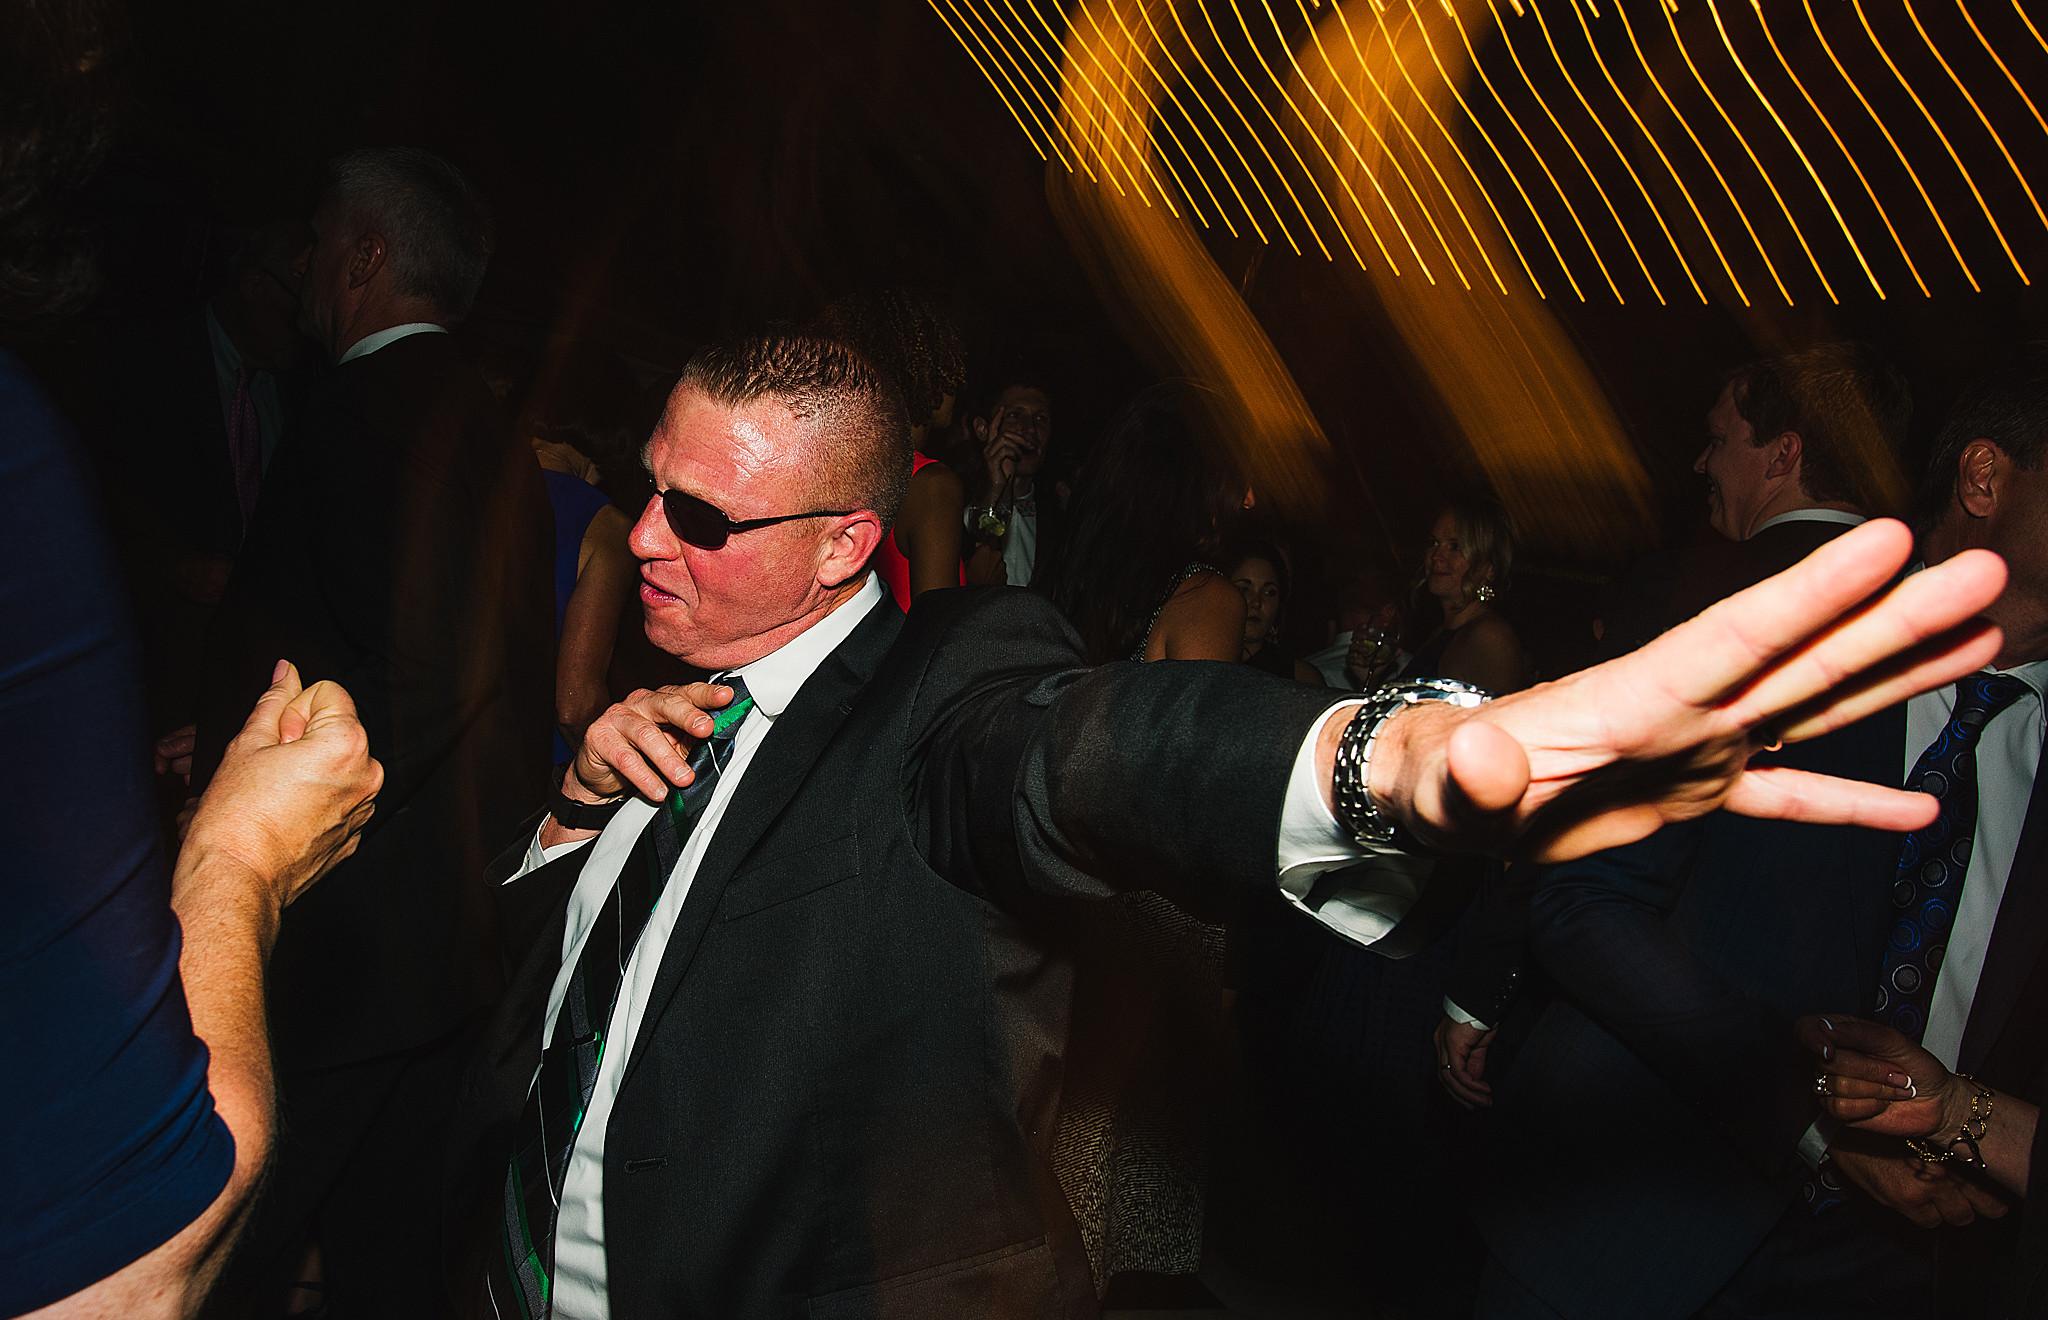 man with sunglasses dances at wedding